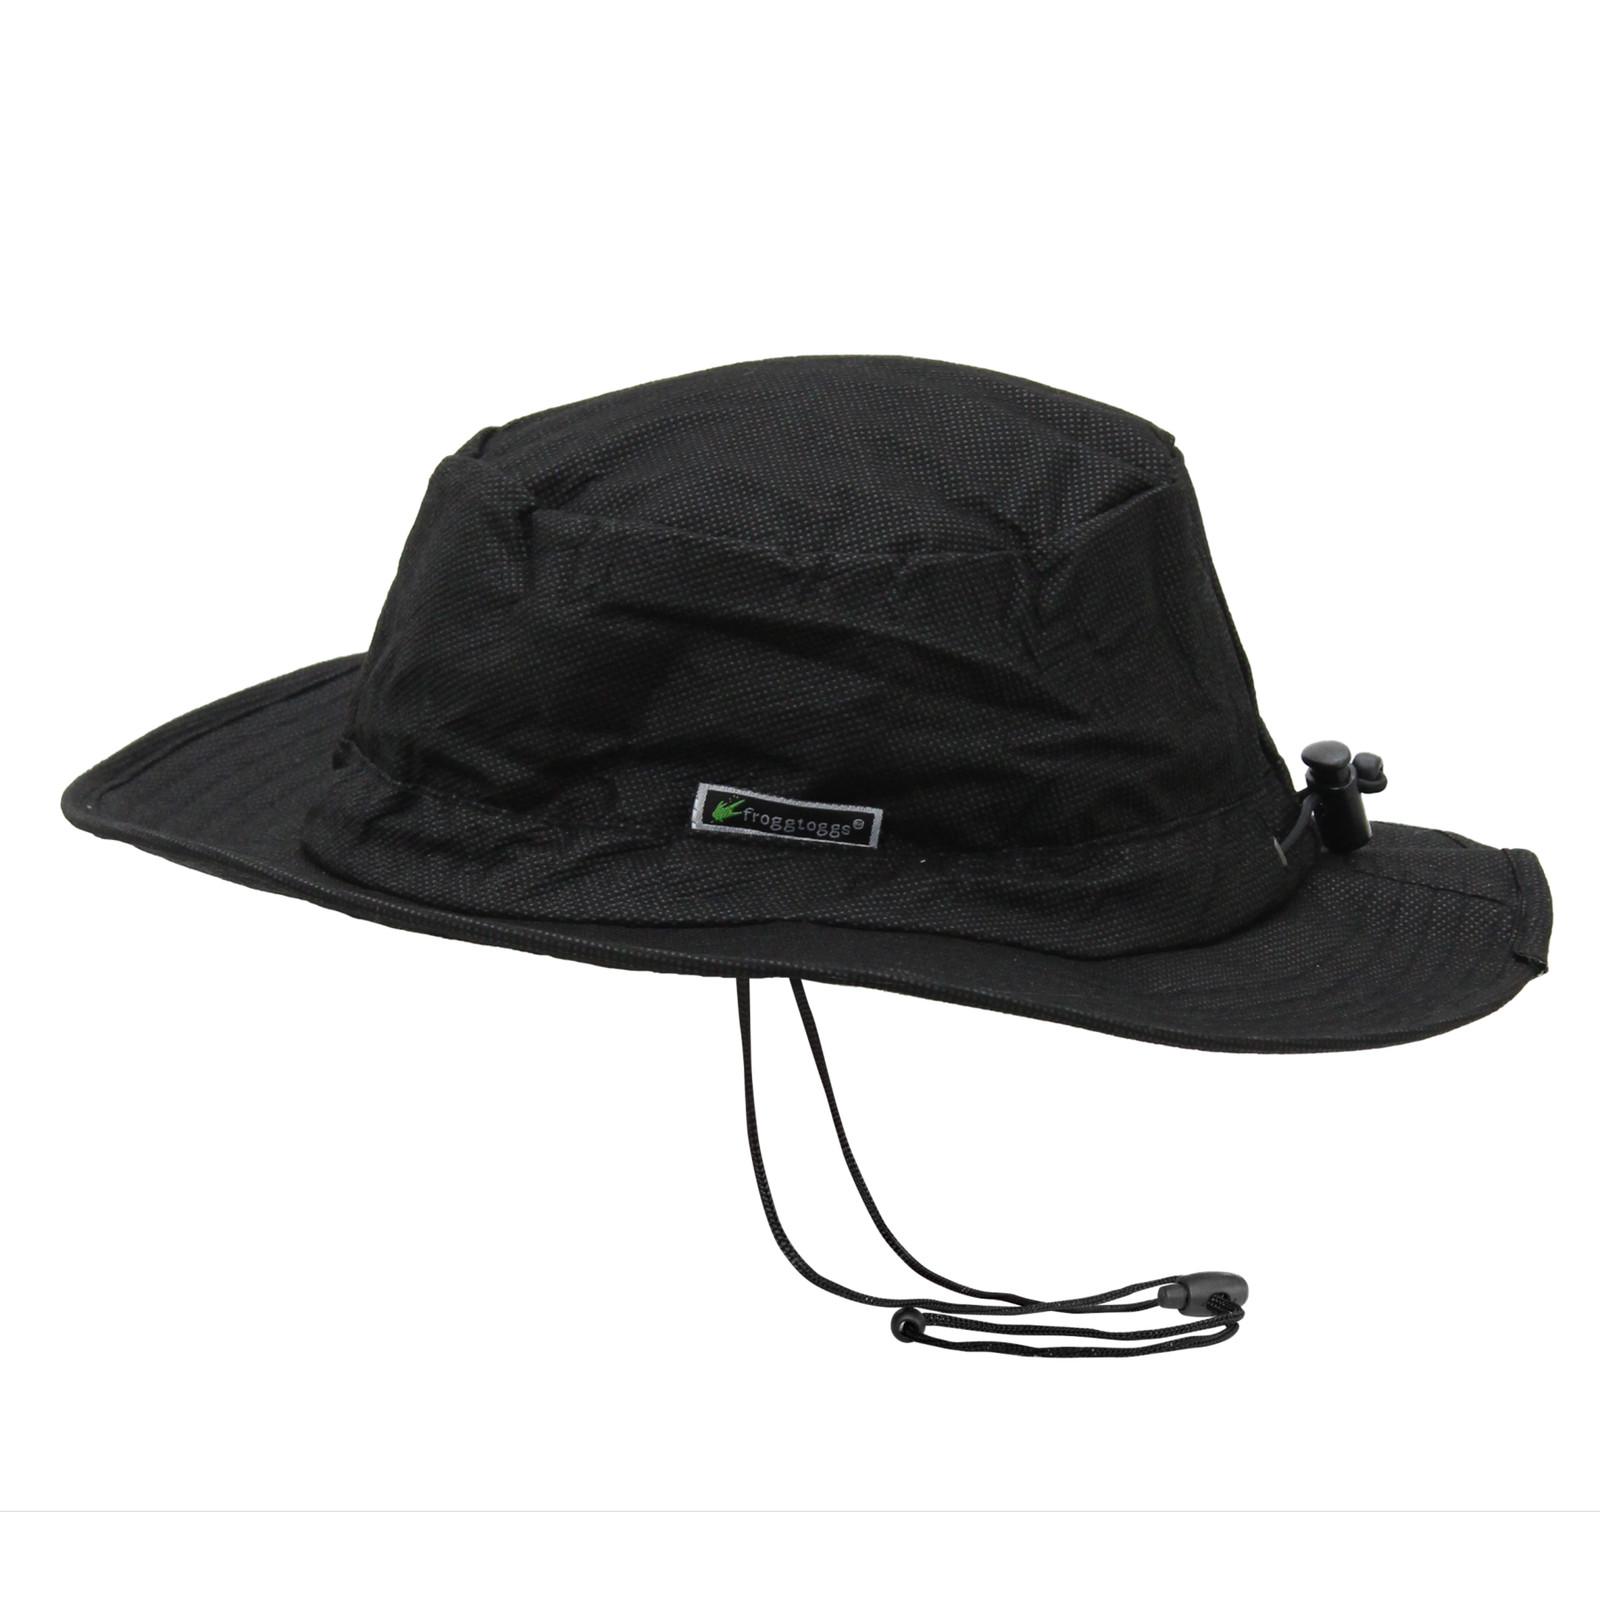 Waterproof Bucket Hat -large